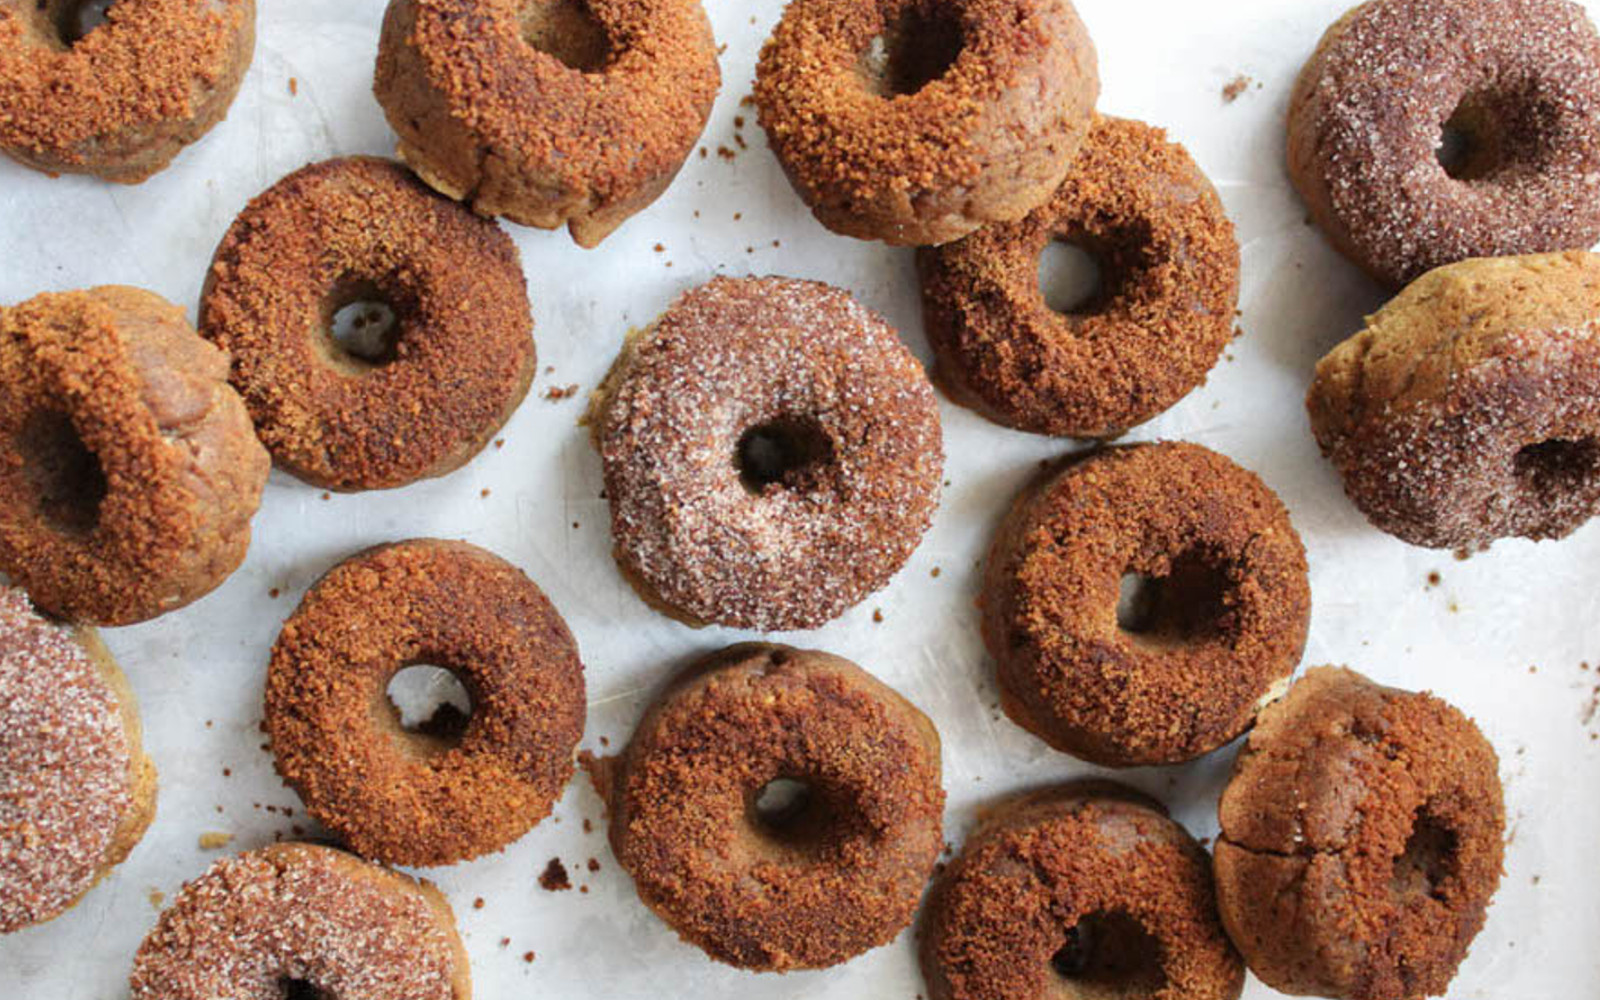 Apple Cider Protein Doughnuts